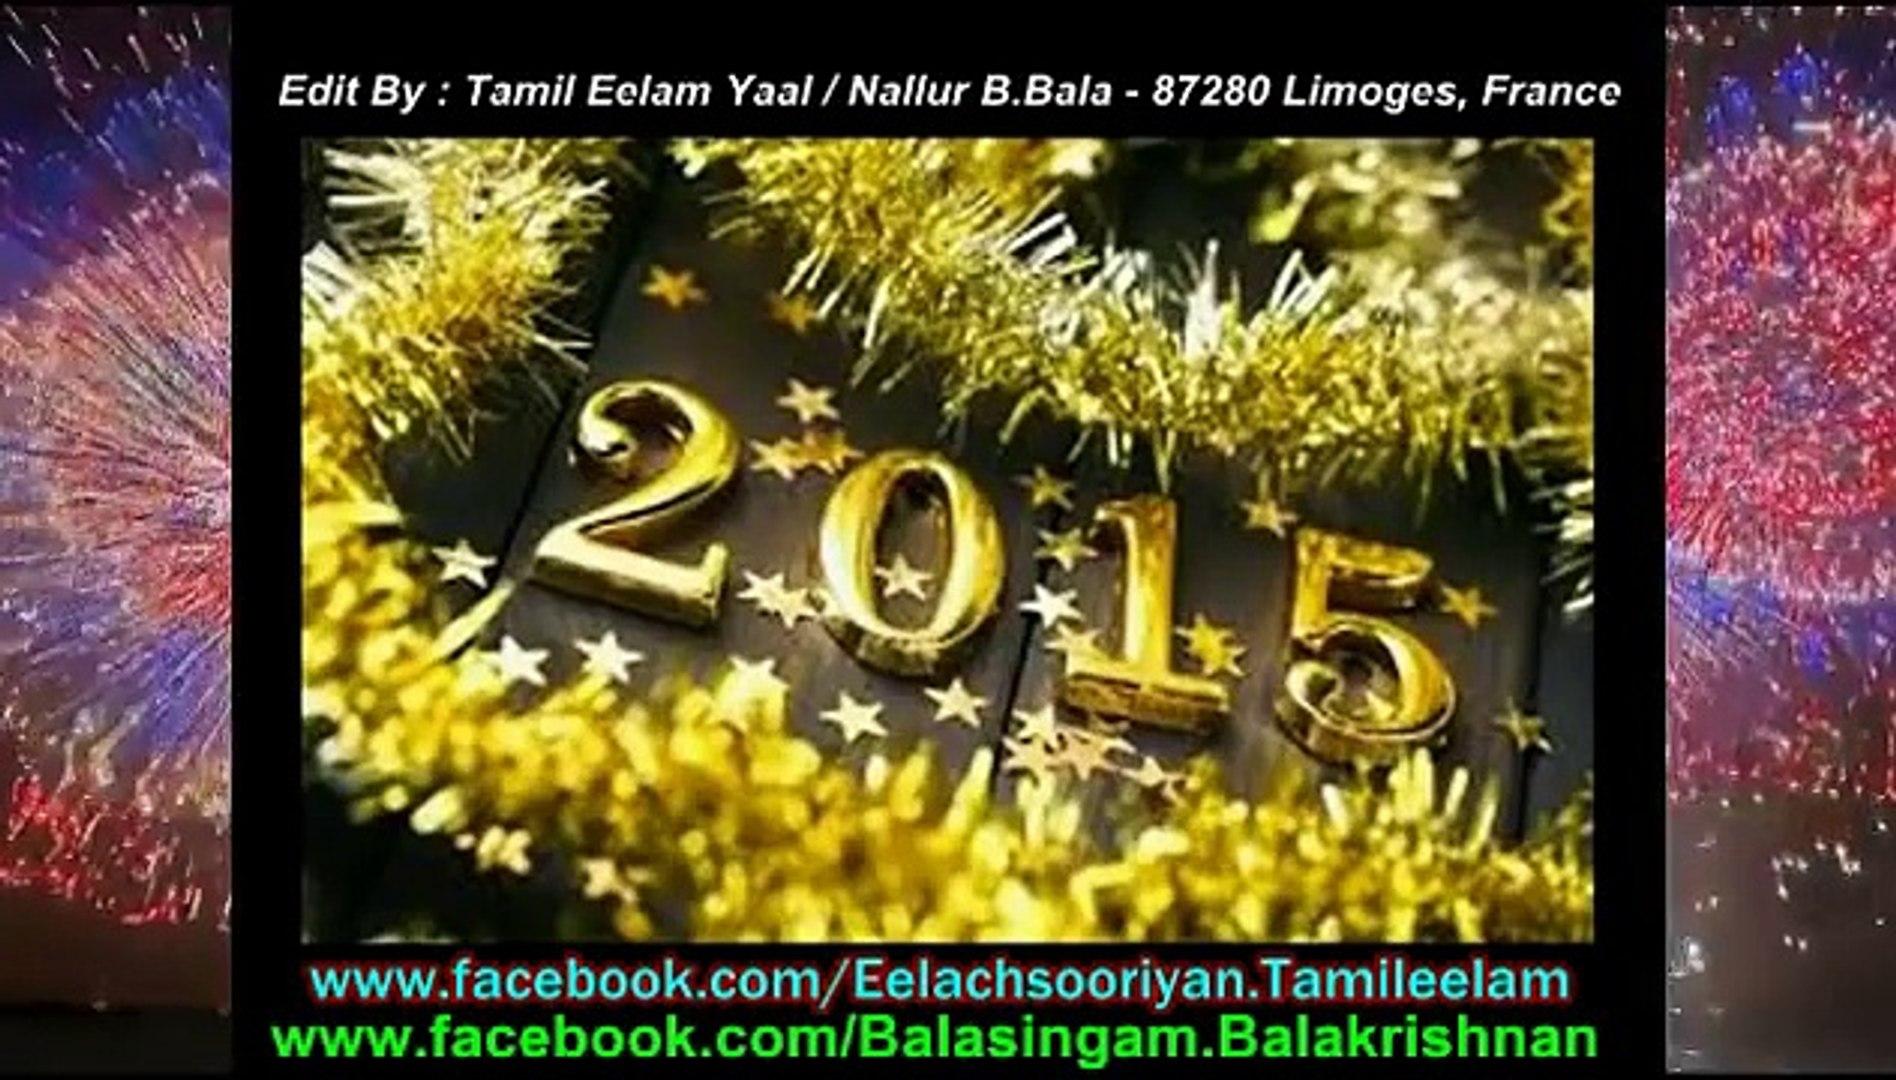 Happy New Year Tamil Songs - Tamil Eelam Yaal Nallur B U.Bala - 87280 Limoges, France